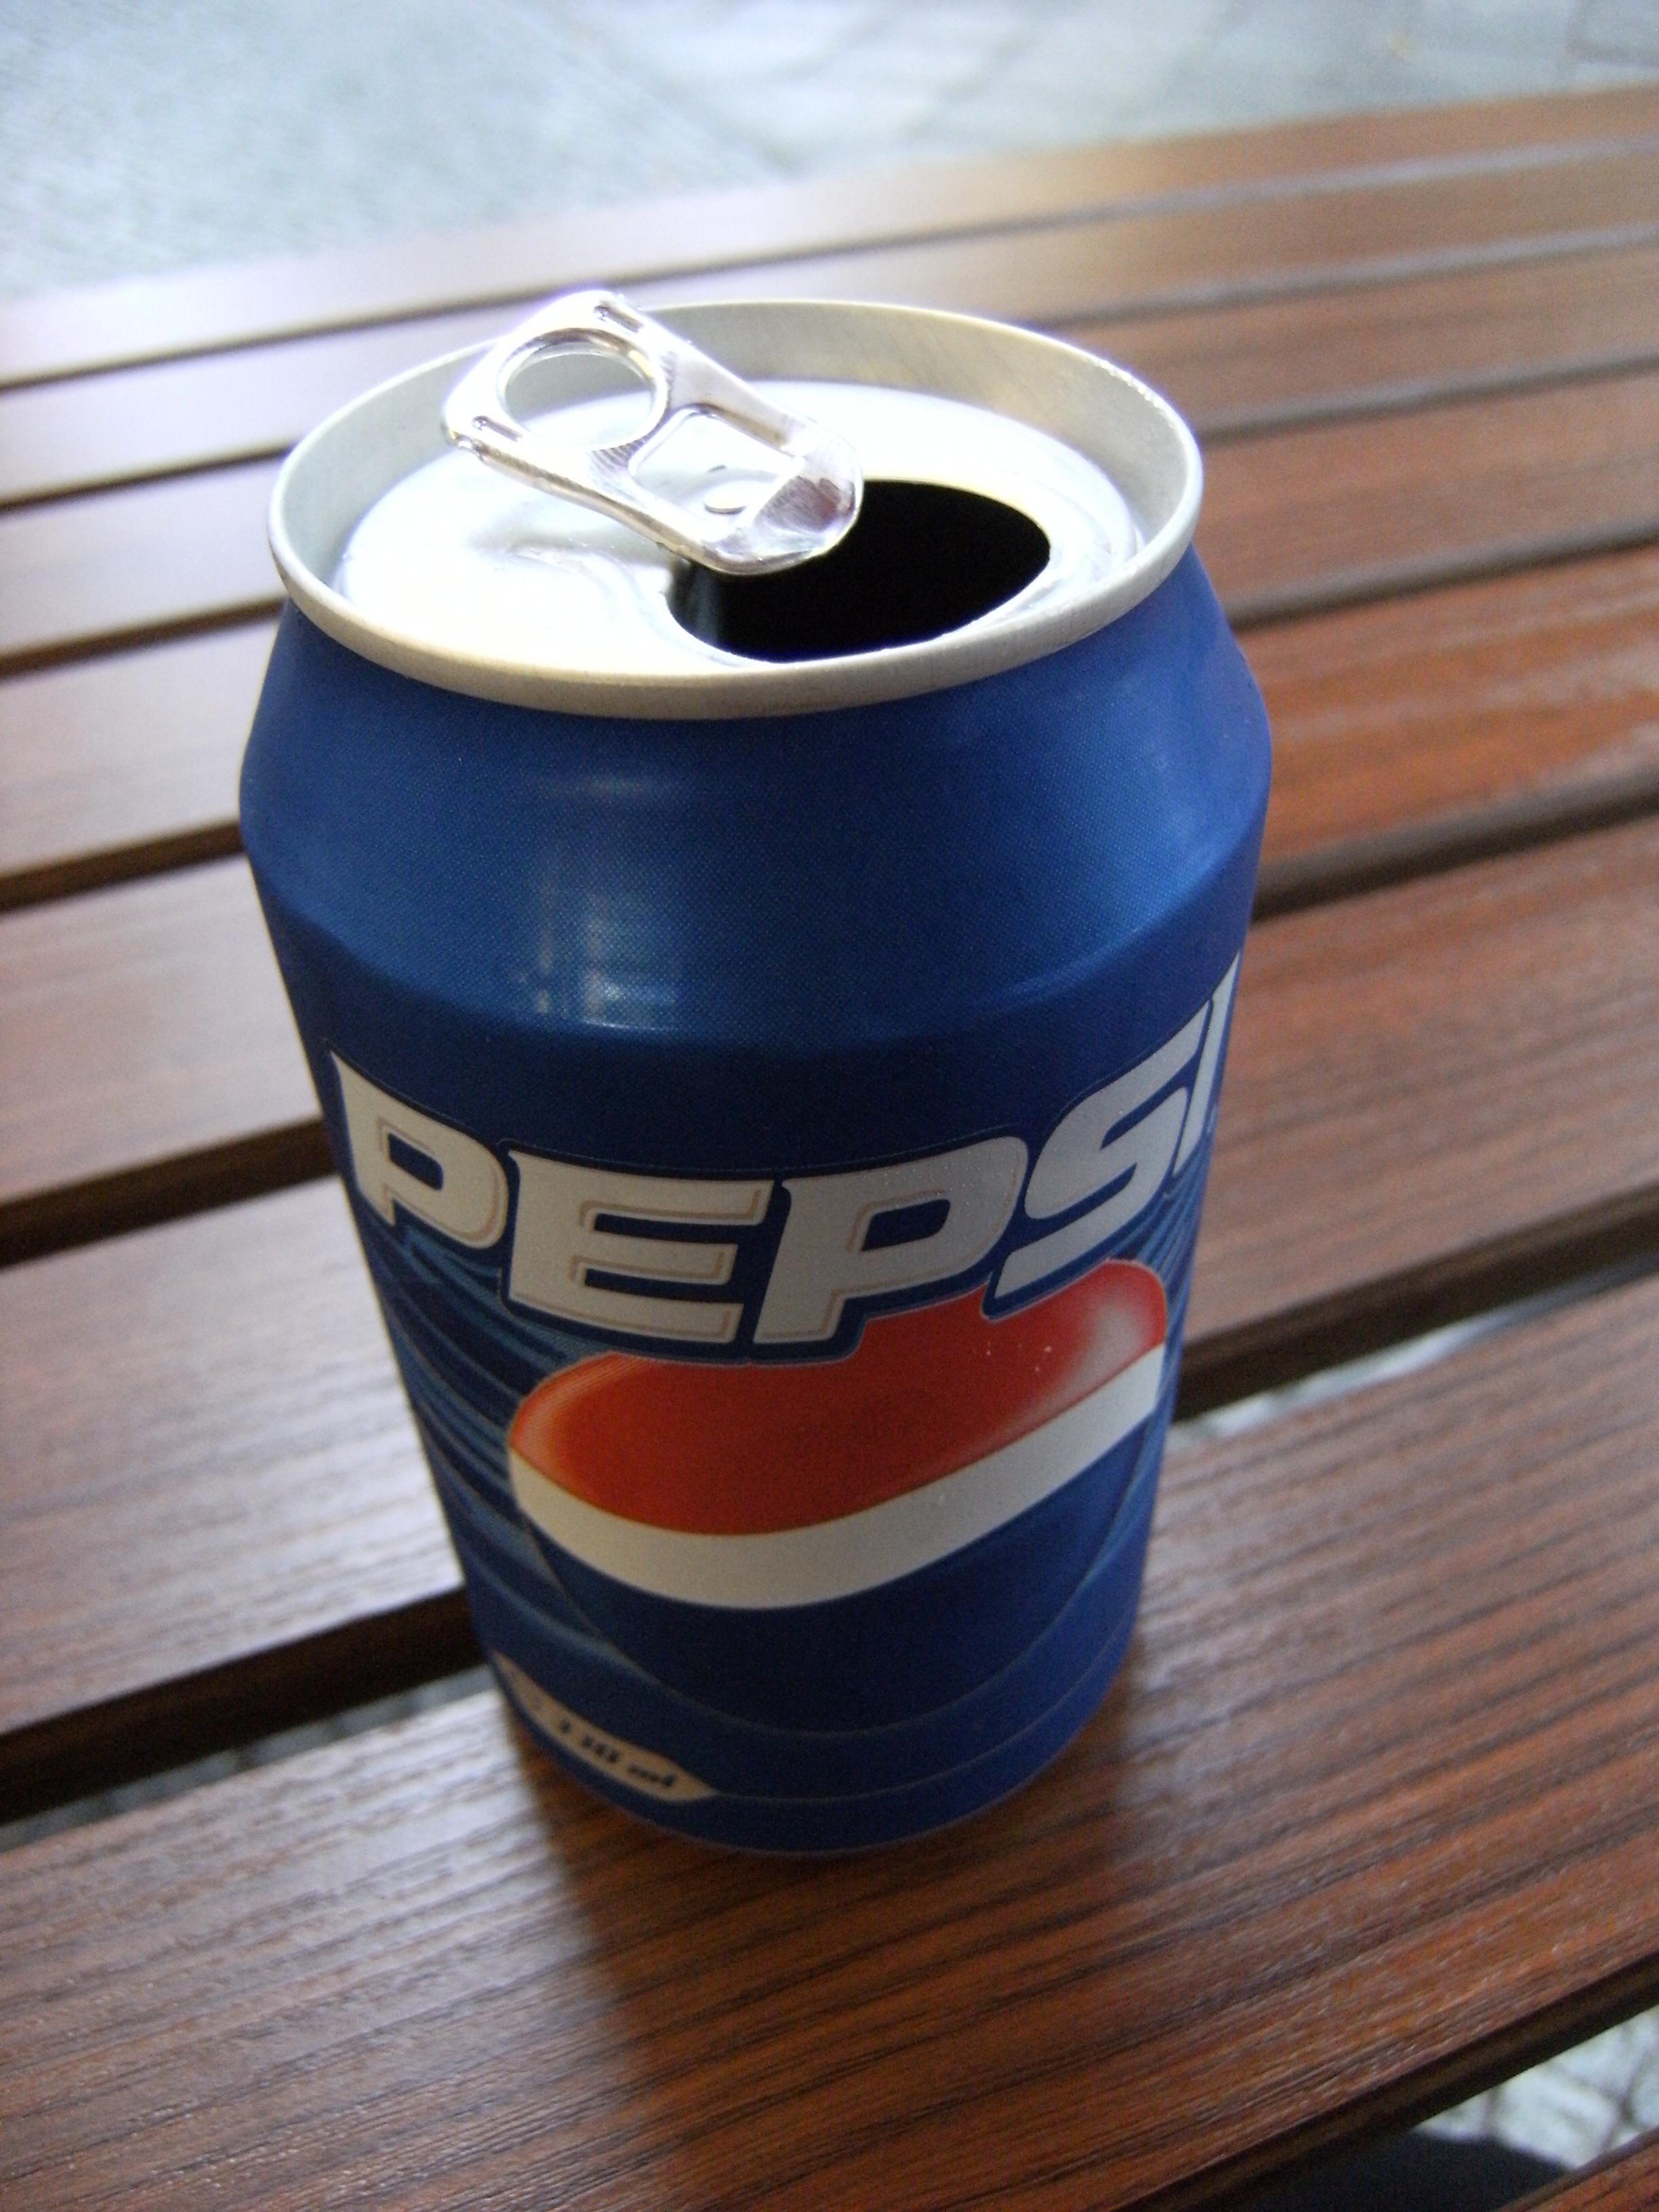 Пепси-кола (pepsi-cola): история, виды, состав | koktejli.ru